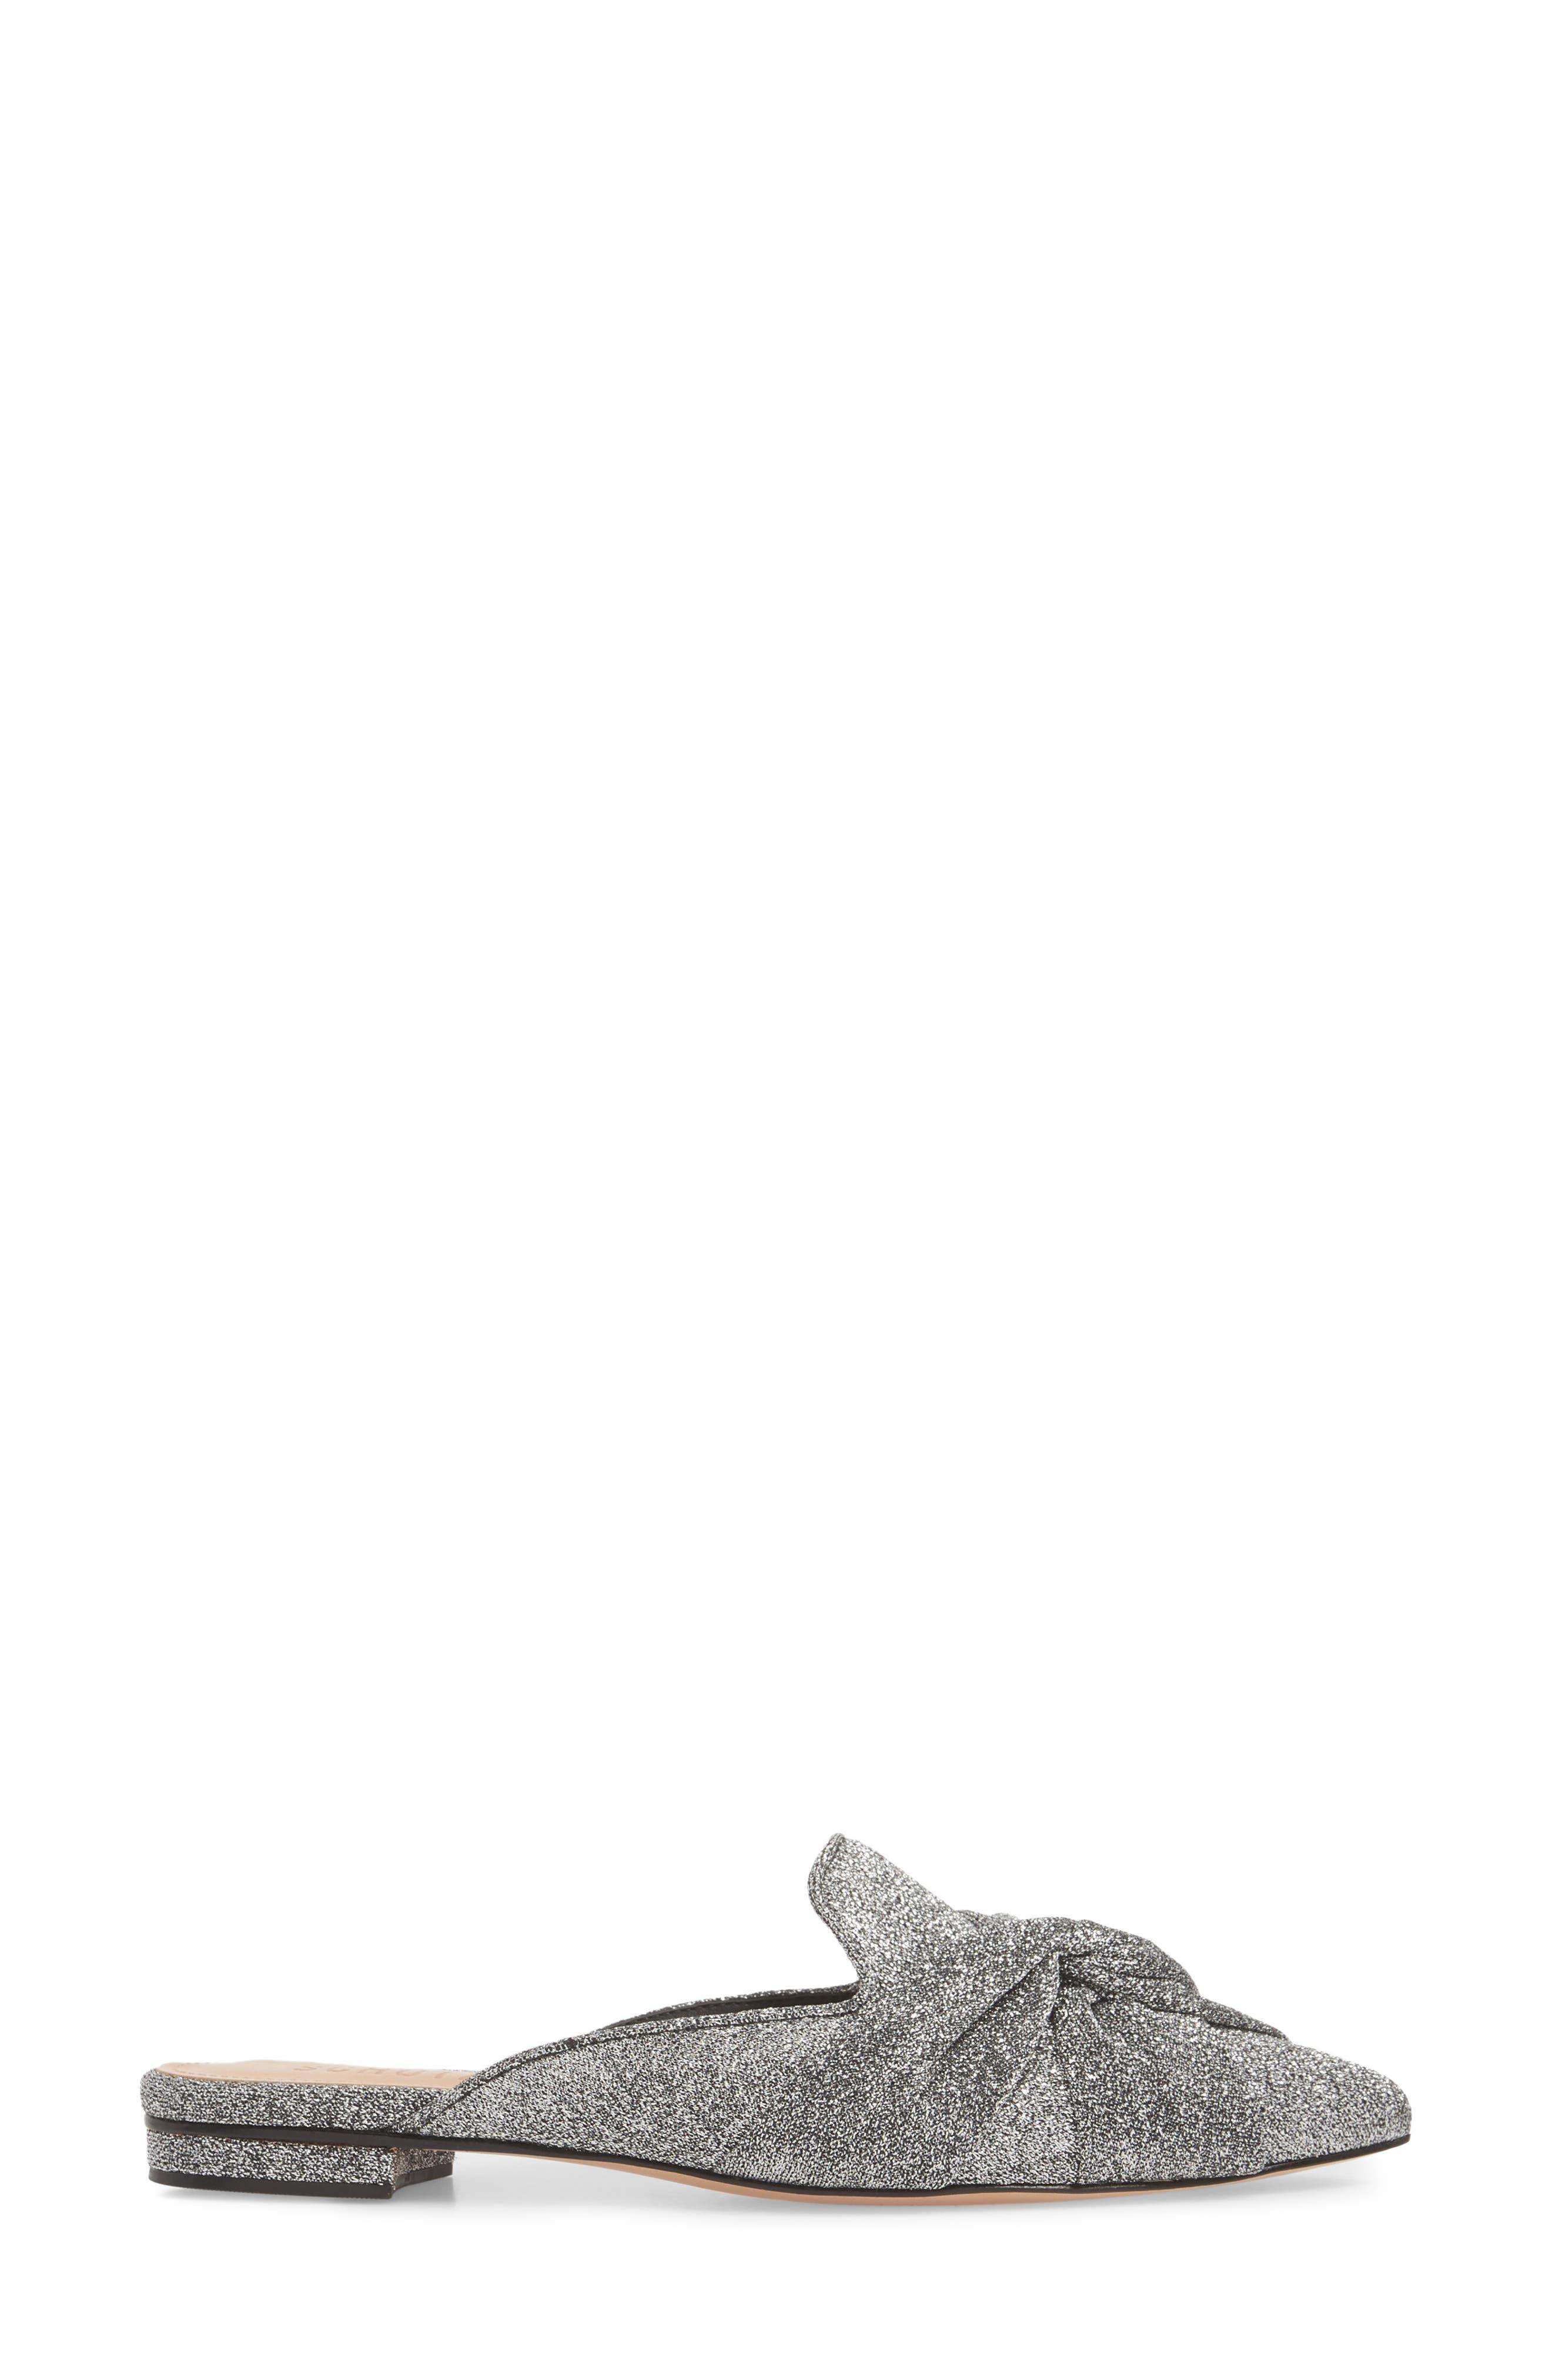 Tina Pointy Toe Slide Sandal,                             Alternate thumbnail 3, color,                             040